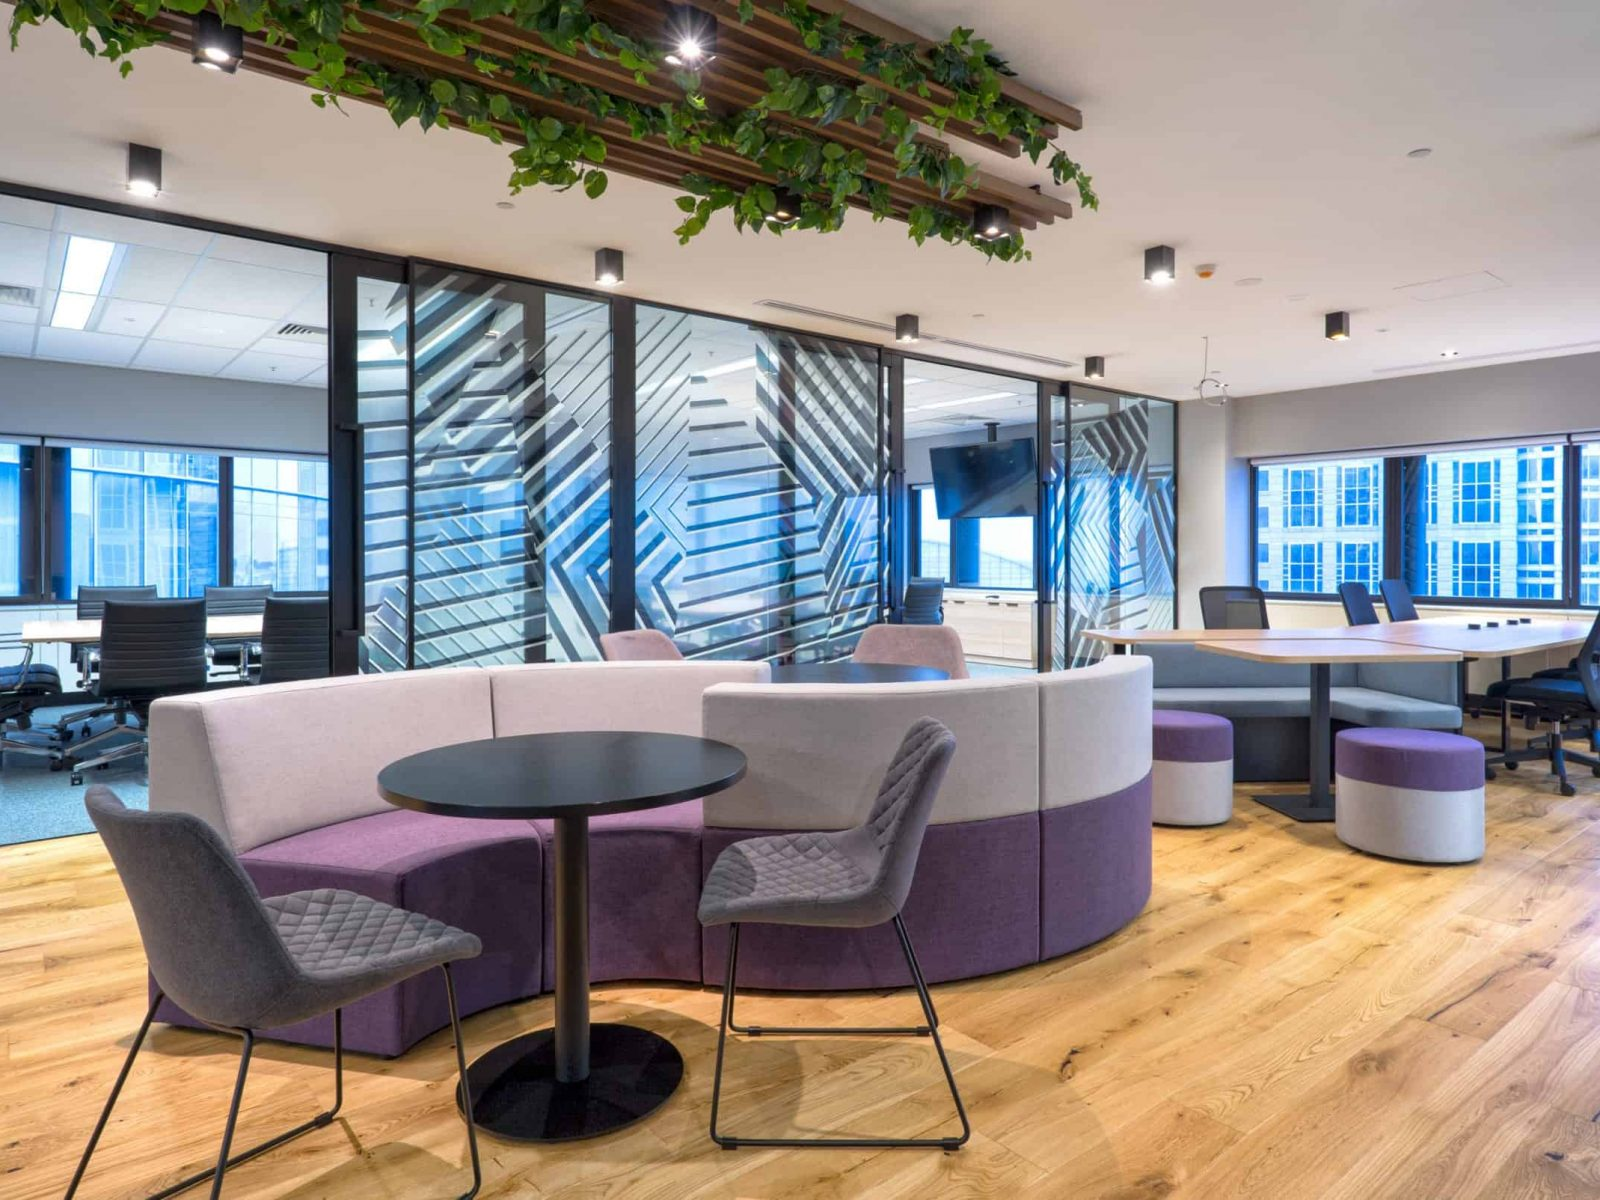 Office Fitouts Sydney, Care Super | Contour Interiors